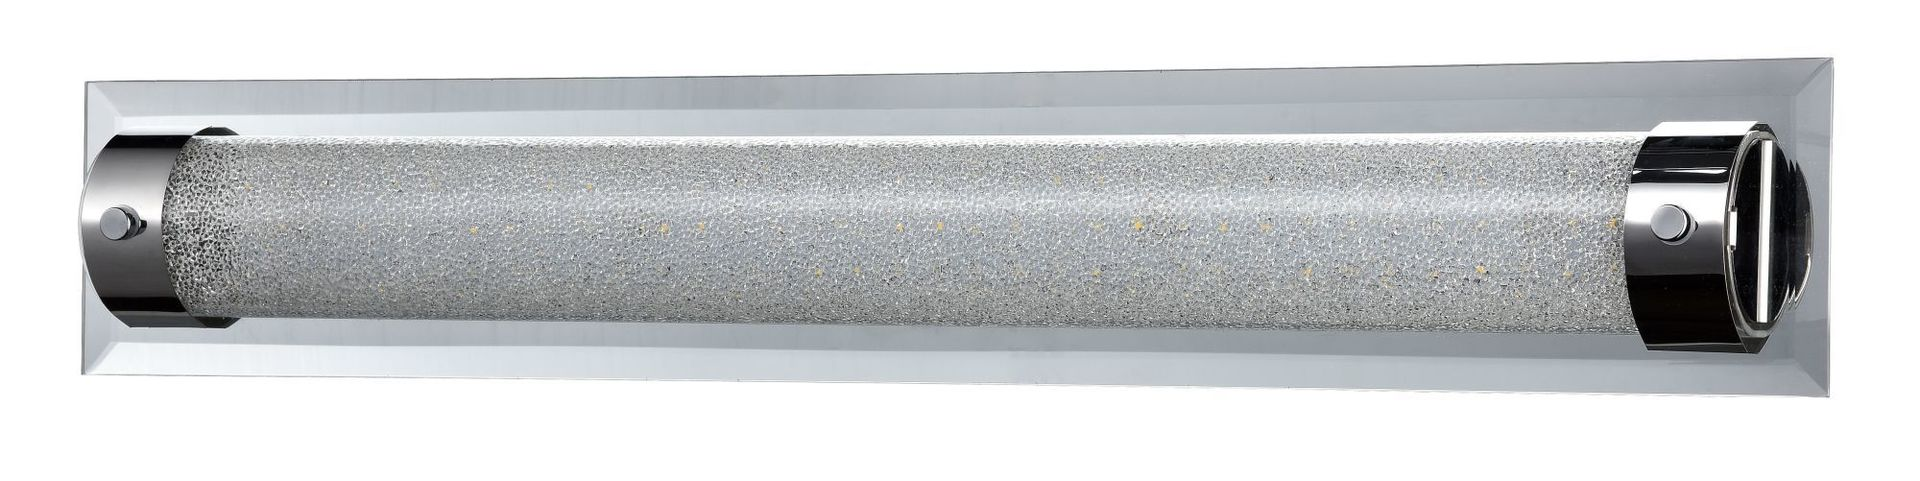 Plafond Maytoni Plasma C444-WL-01-21W-N